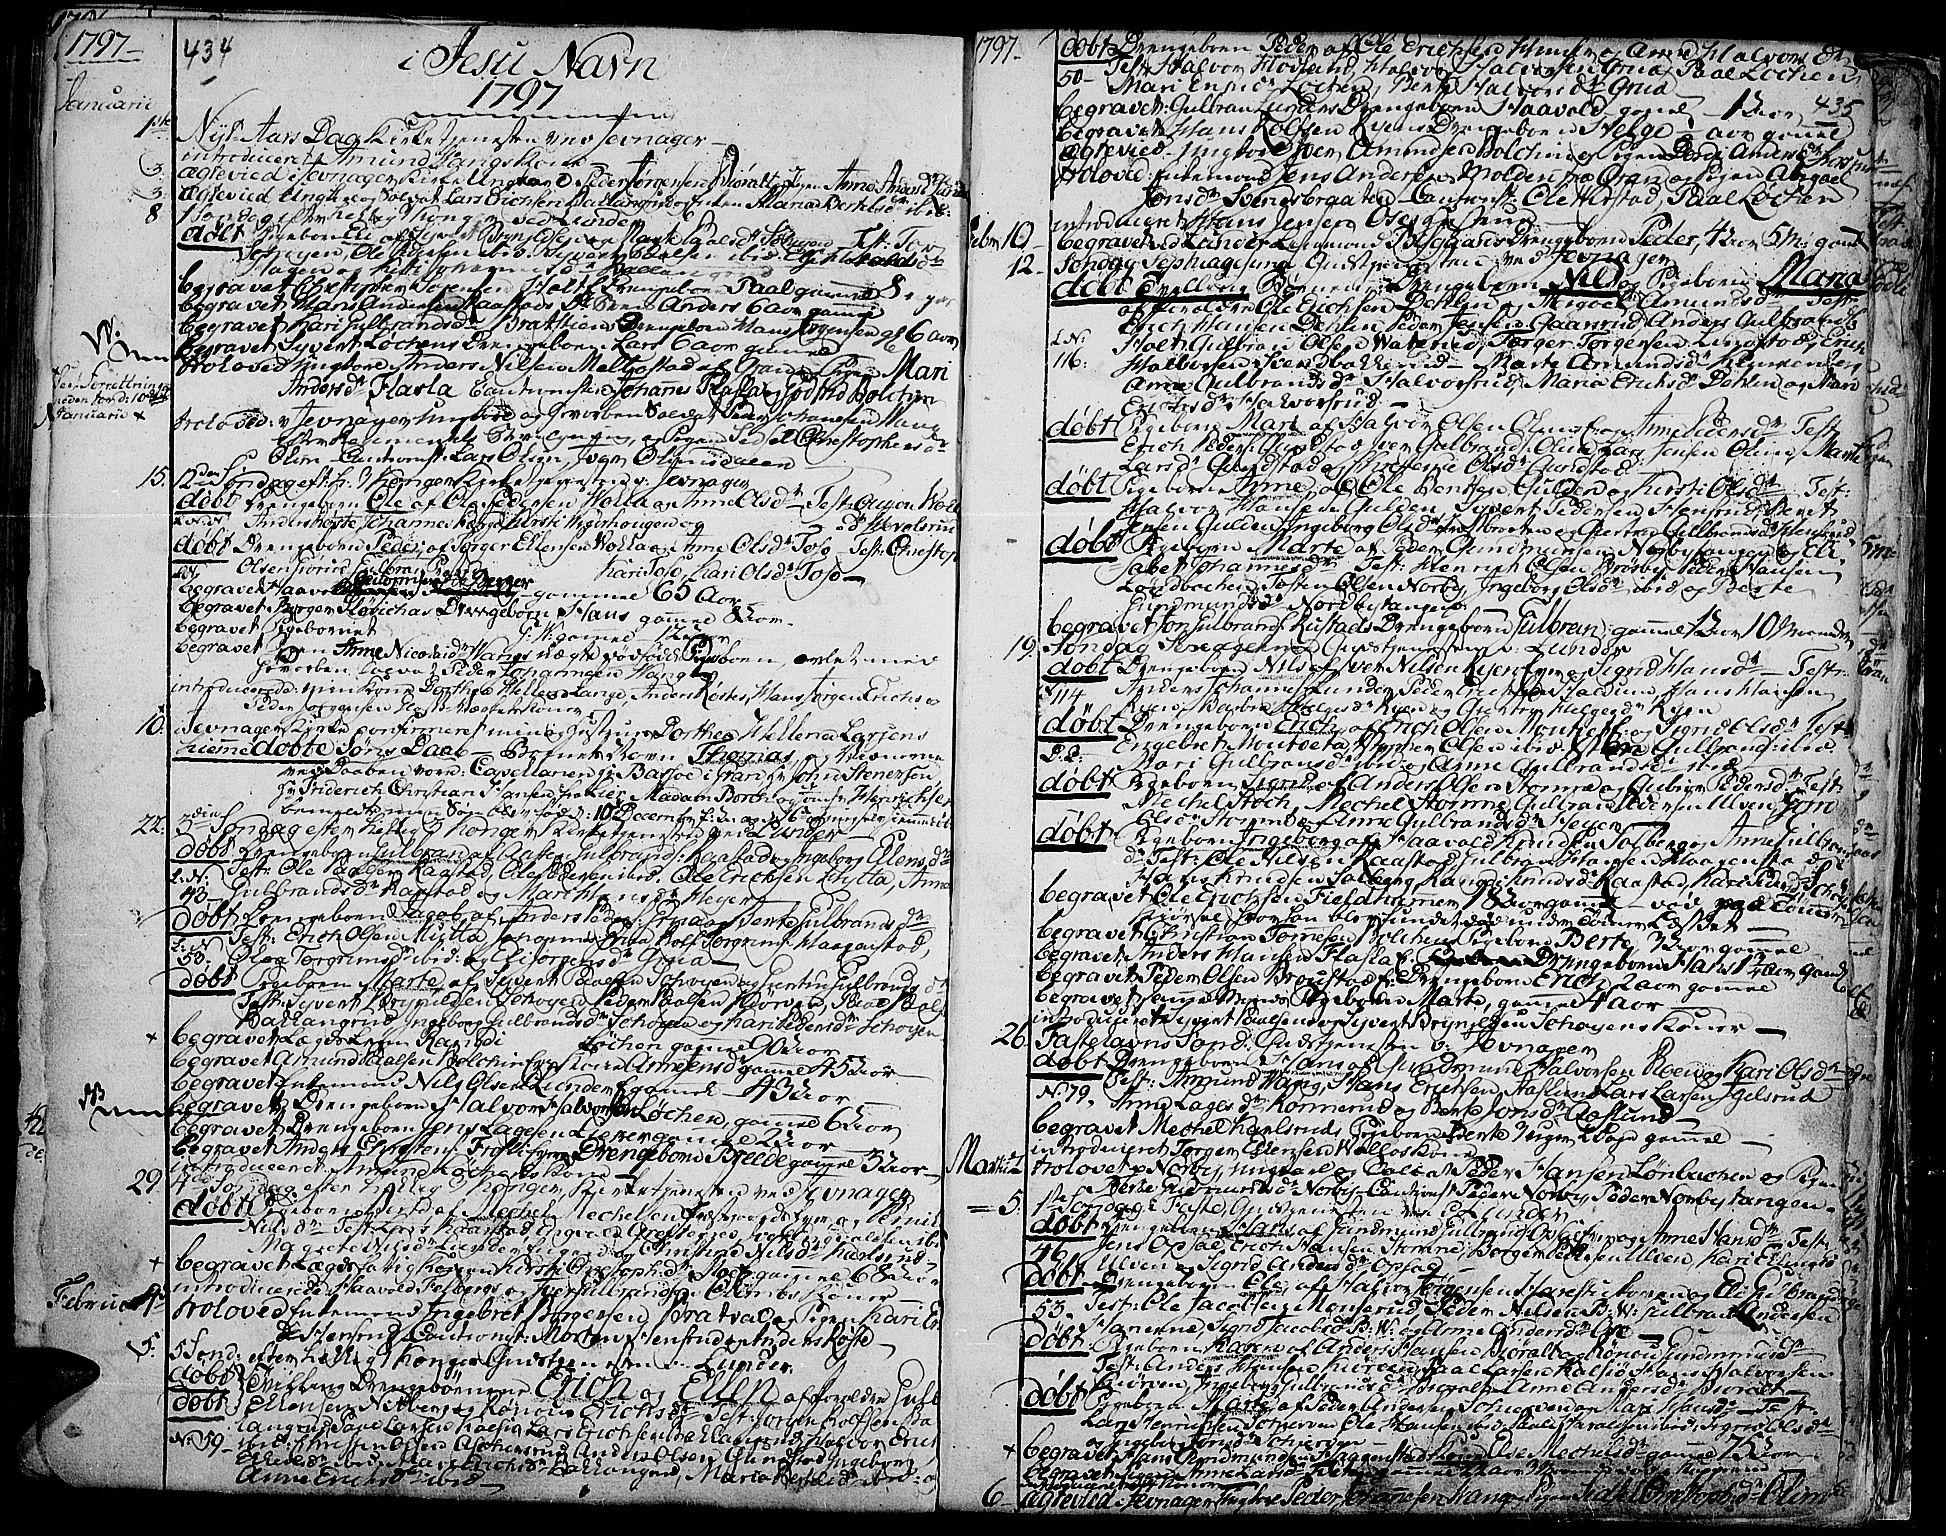 SAH, Jevnaker prestekontor, Ministerialbok nr. 3, 1752-1799, s. 434-435